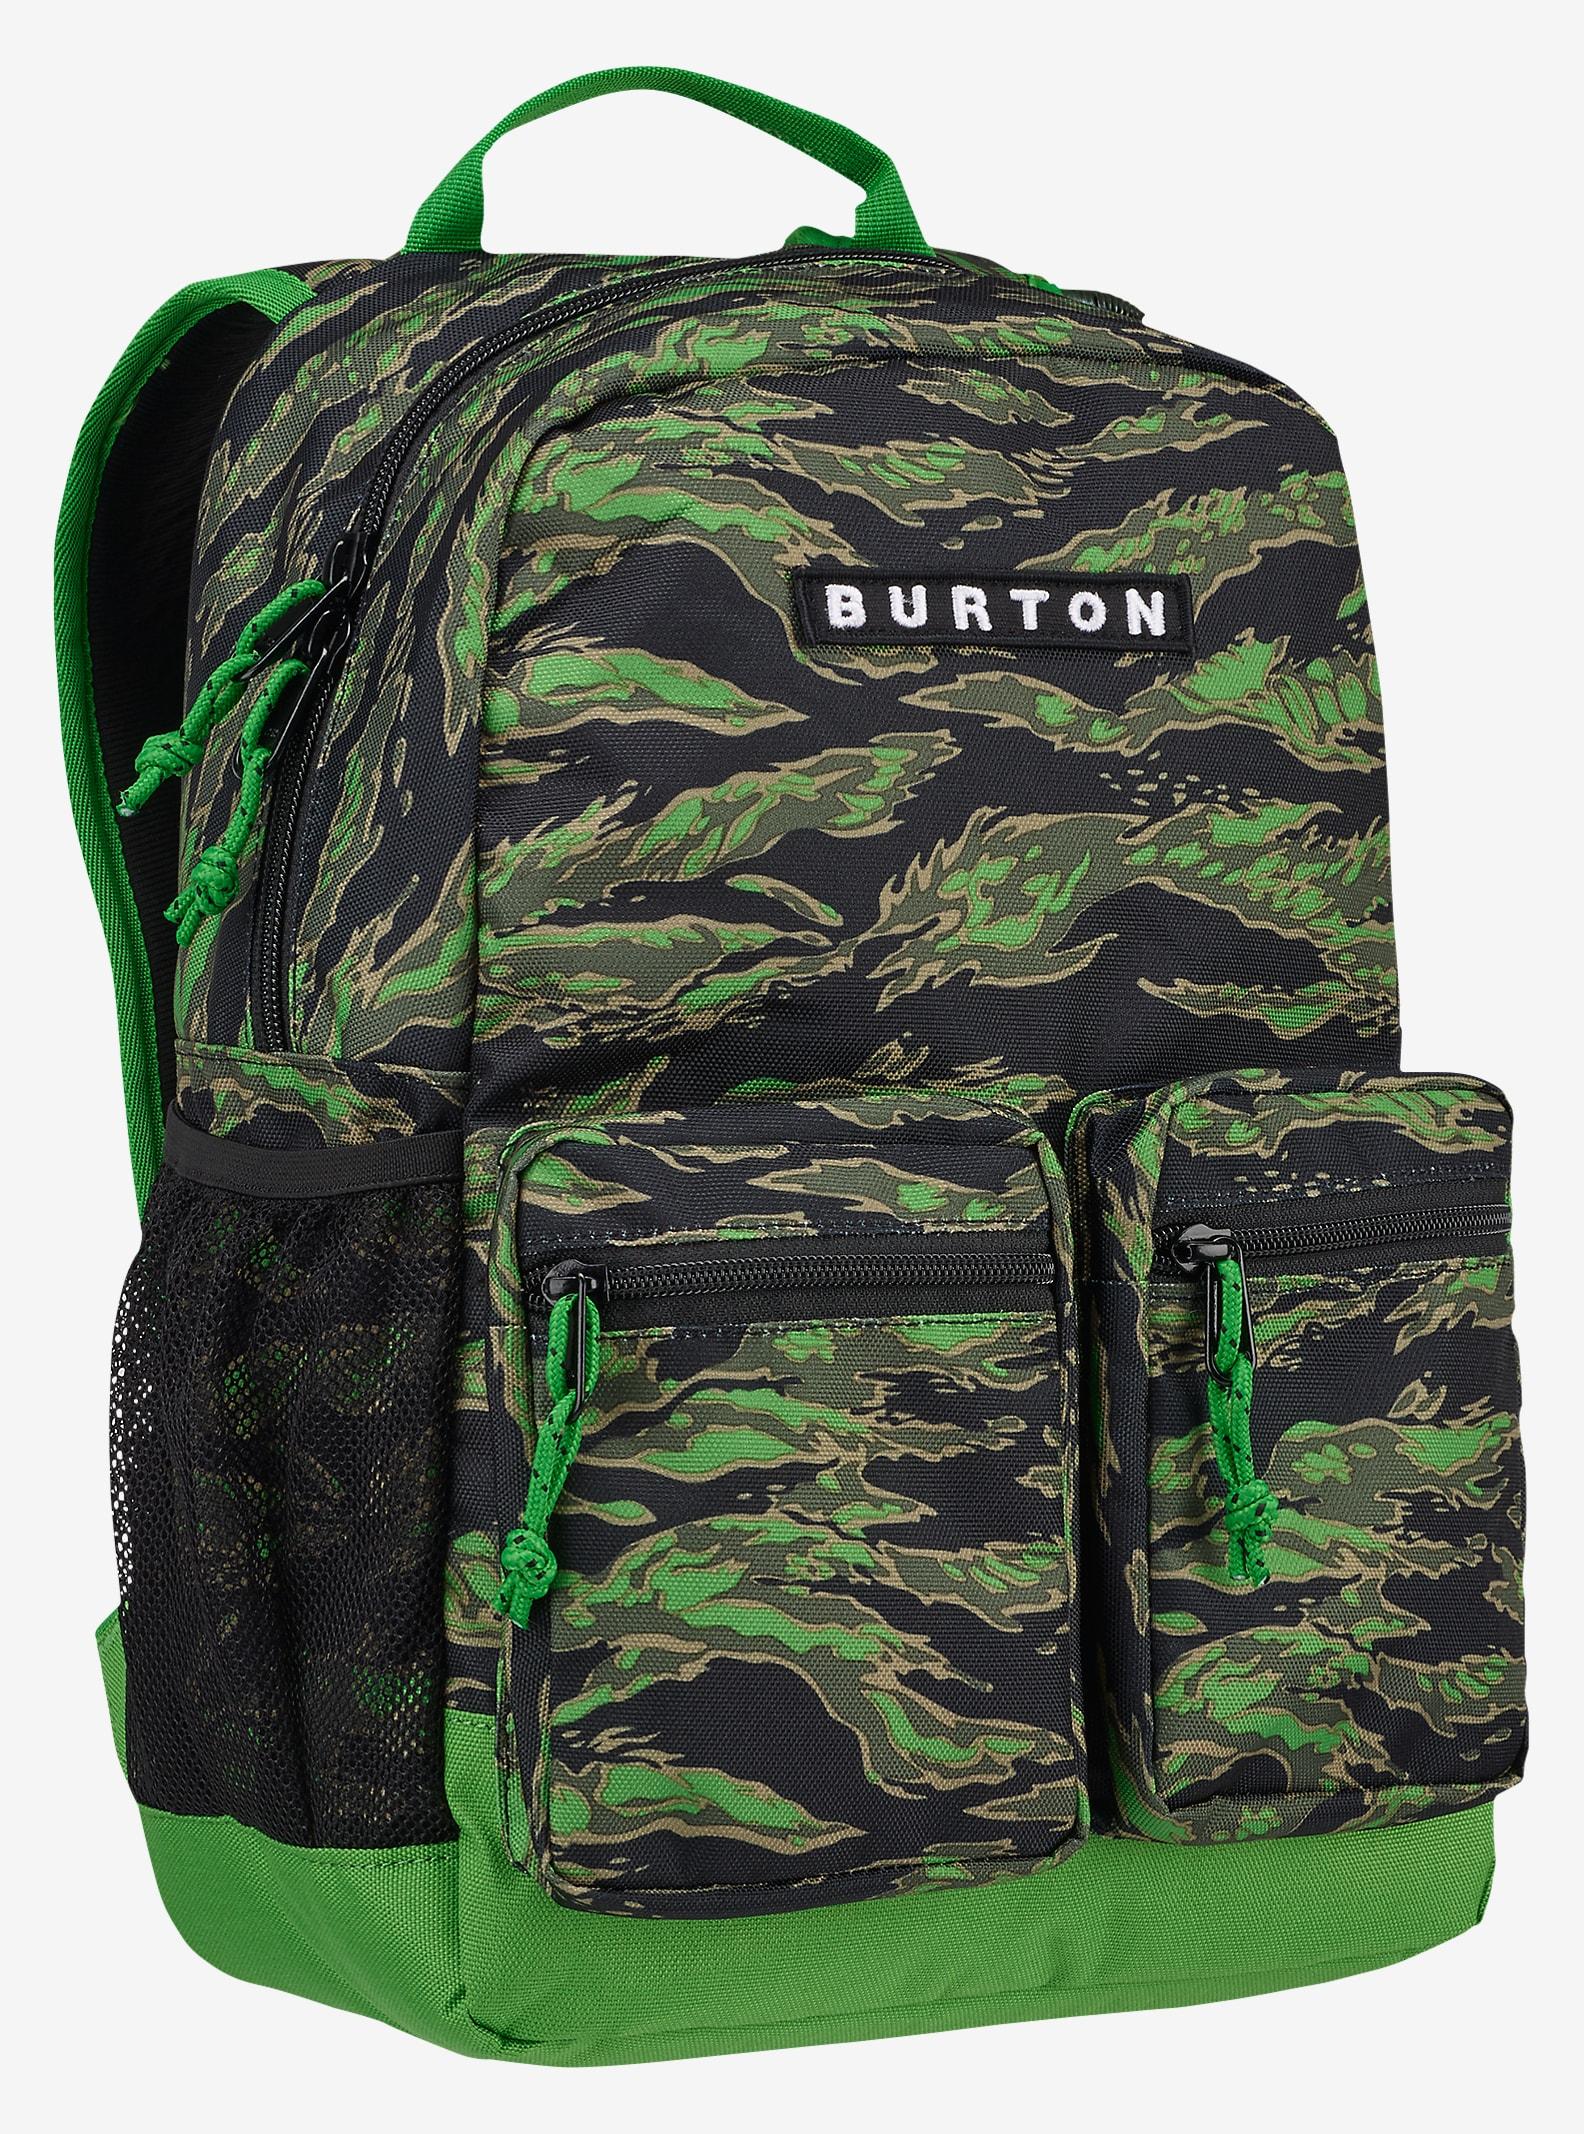 Burton Kids' Gromlet Backpack shown in Slime Camo Print